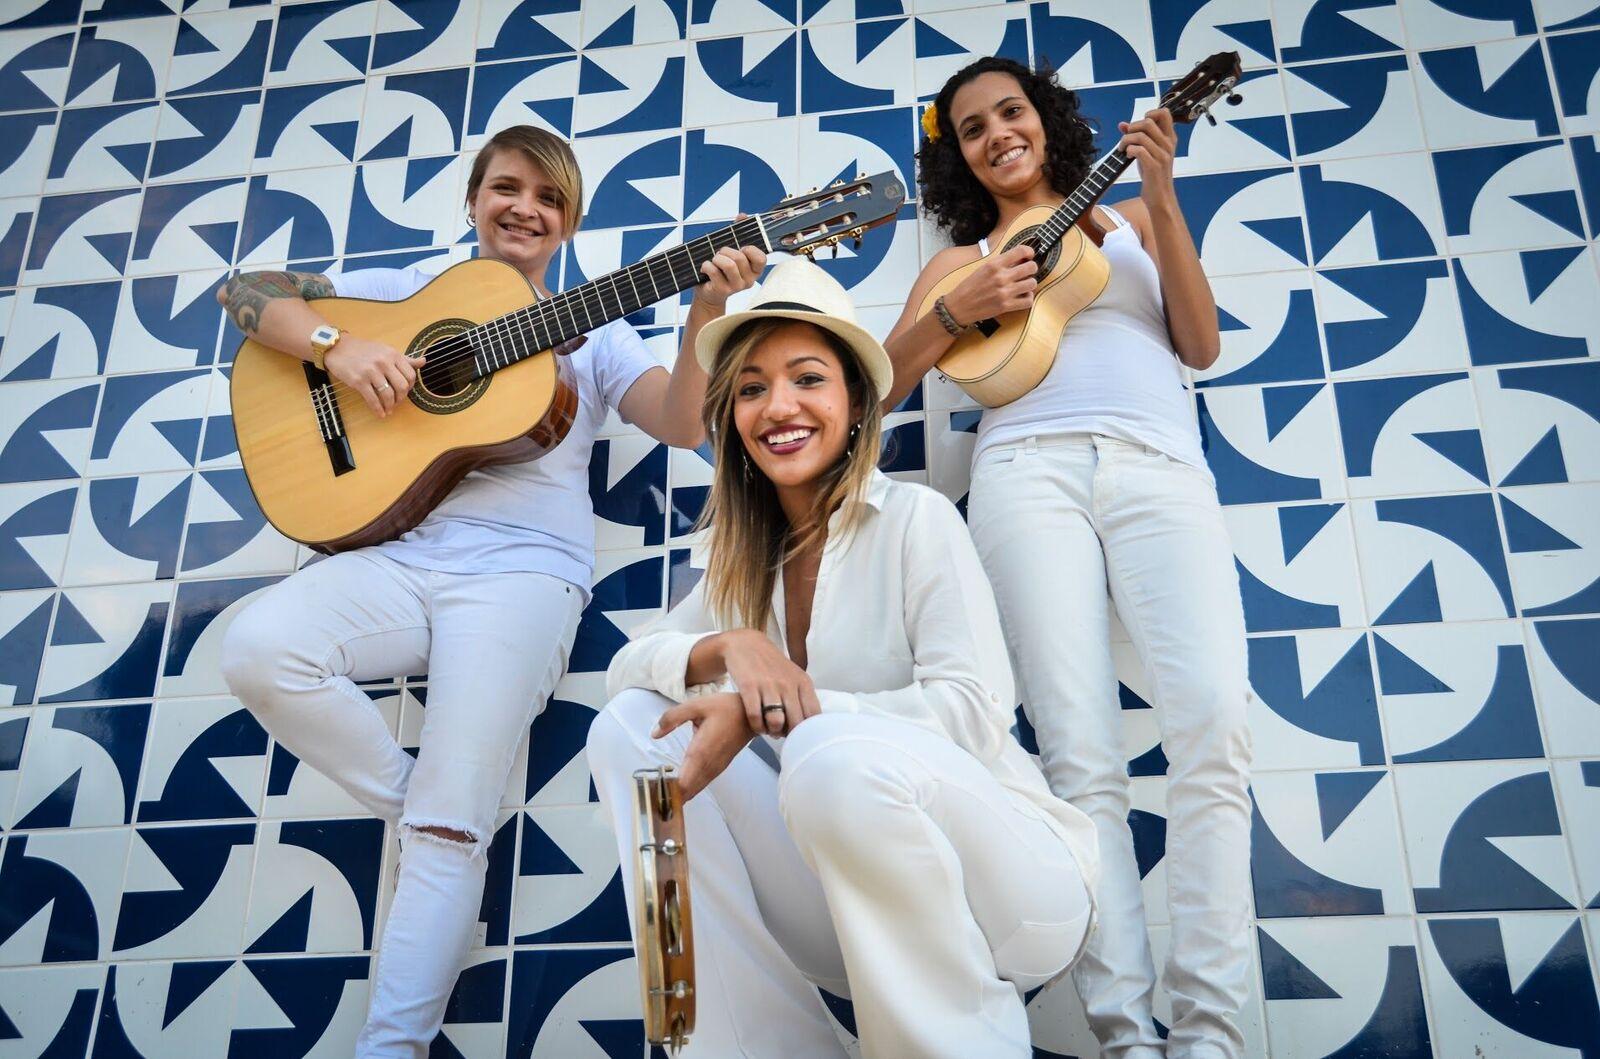 Trio à Brasileira_Foto de Marianne Veloso (12)_preview.jpeg